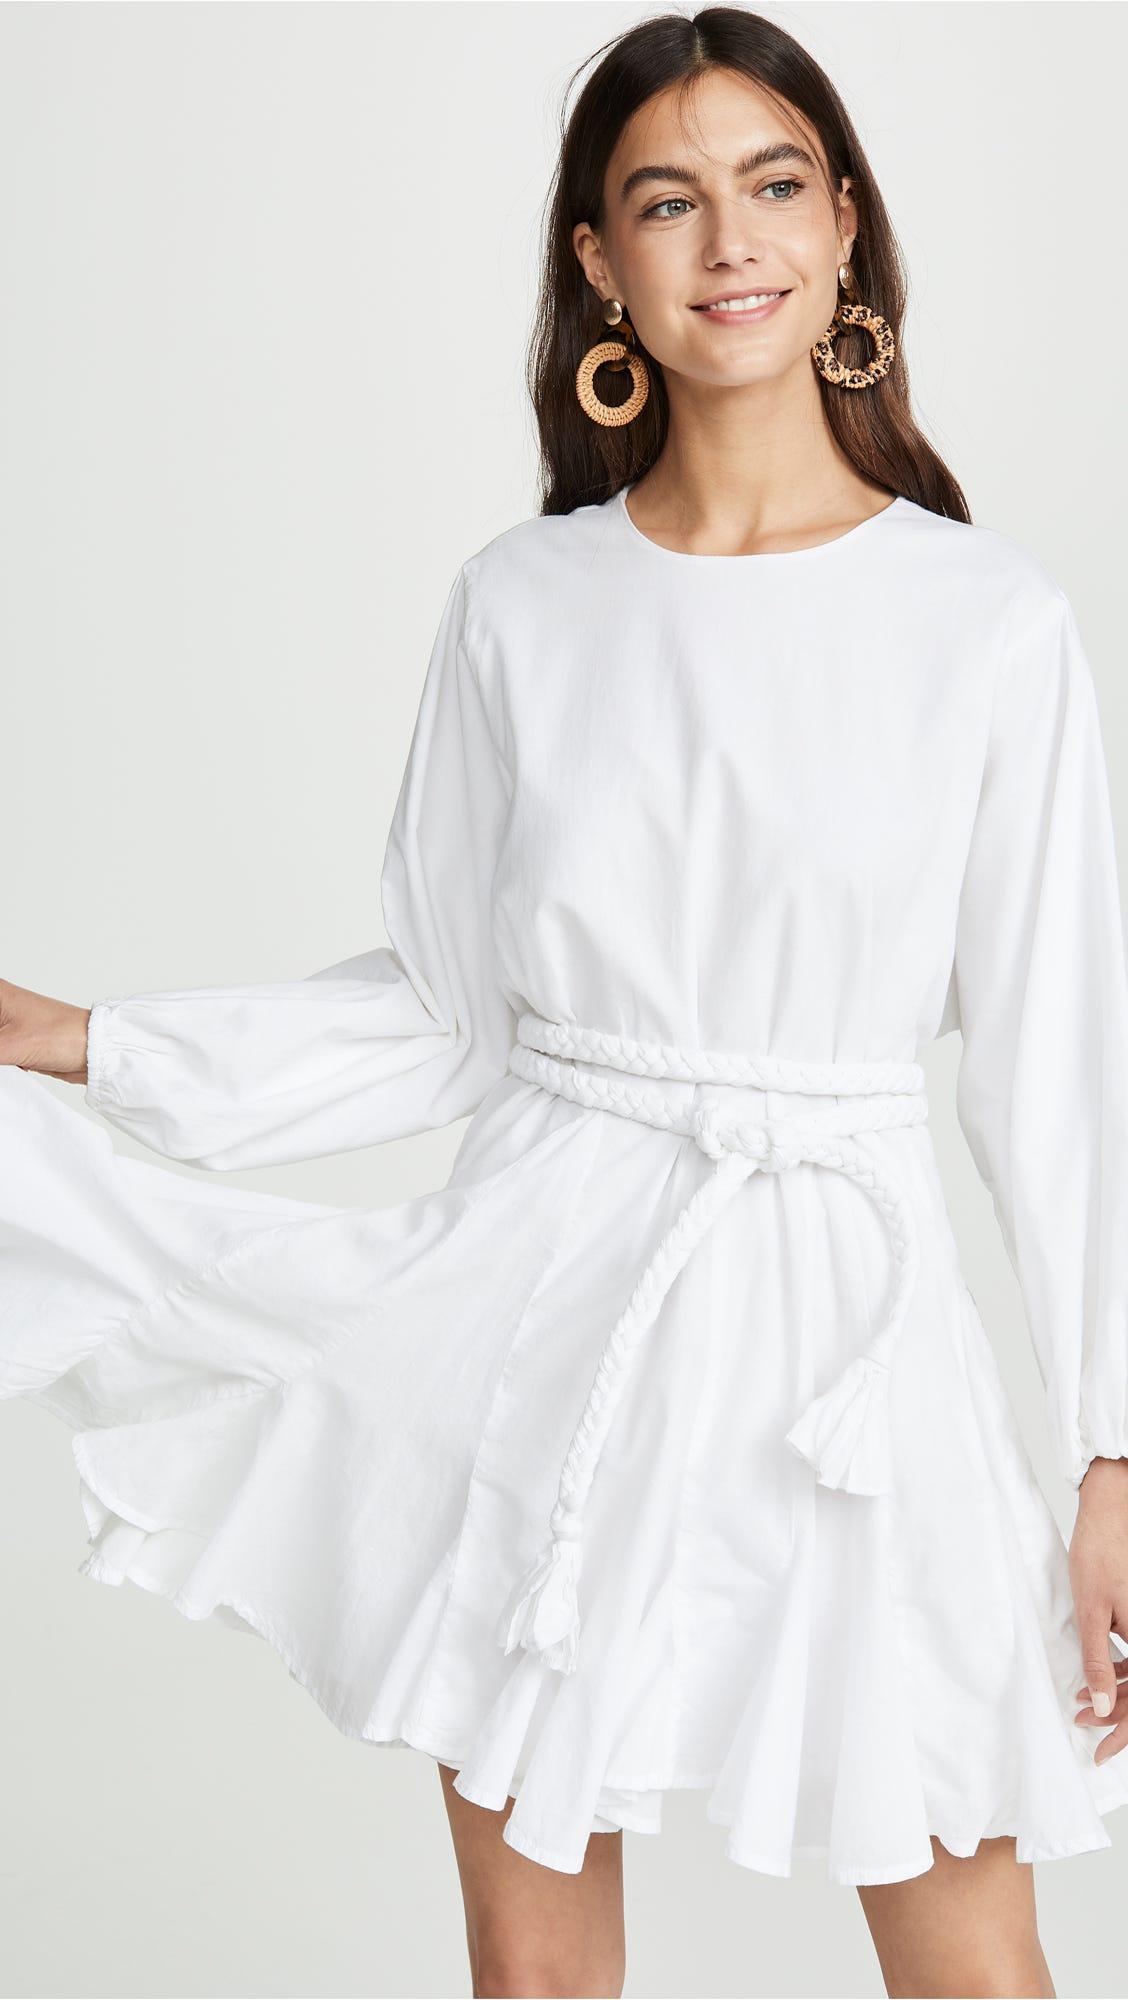 e825a6ae5b Style White Dresses For Women - Summer 2019 Trends